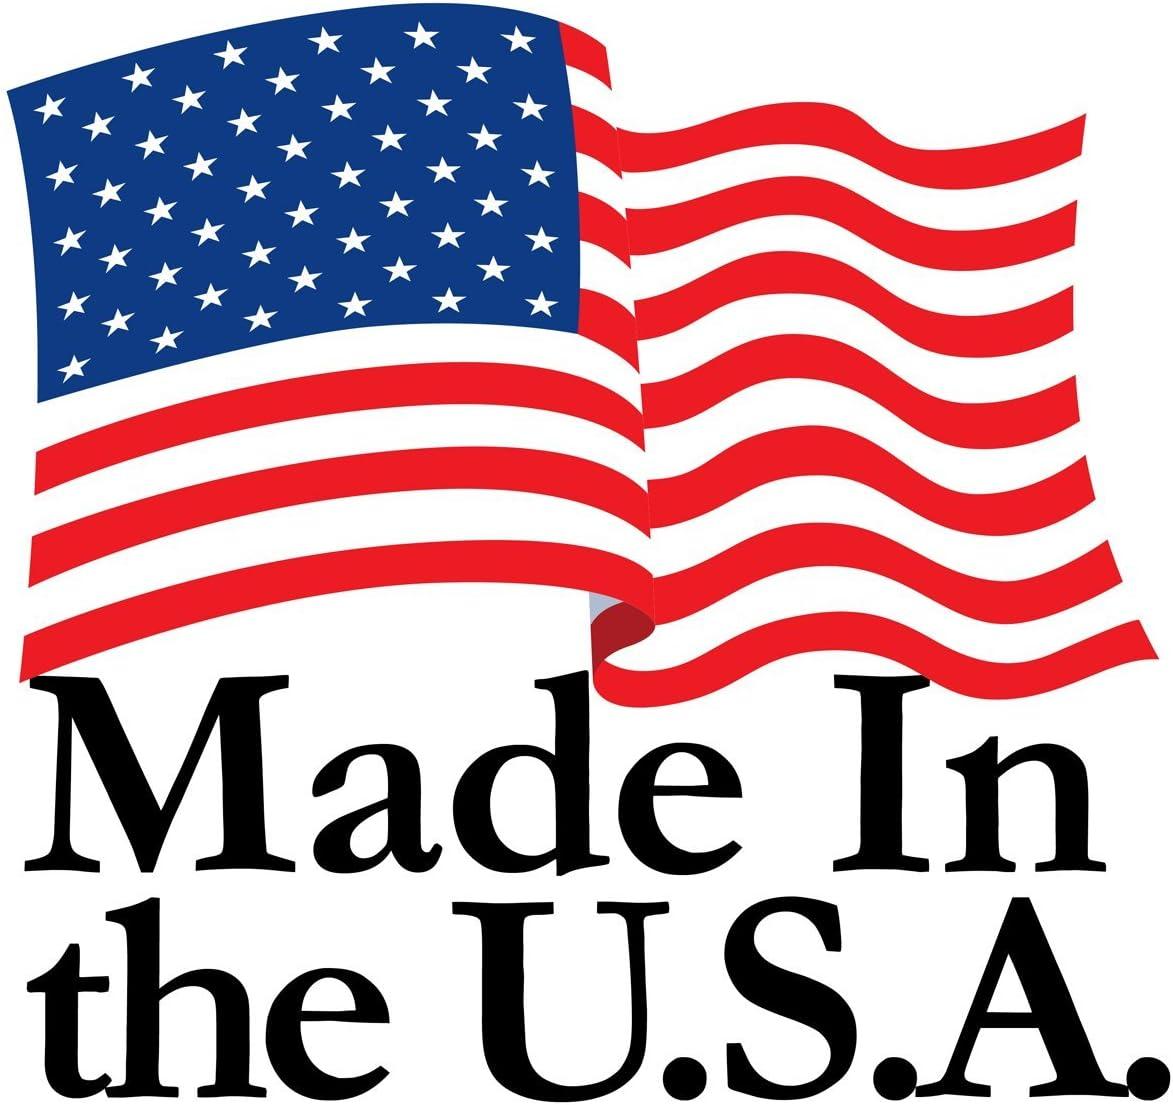 2x6 12,800 lbs Vertical Endless Nylon Lifting Slings 10,200 lbs Choker USA Made Nylon 900 webbing DD Sling USA Made 25,600 lbs Basket 2 Ply 1 /& 2 Widths By 6 to 12 Lengths in Listing